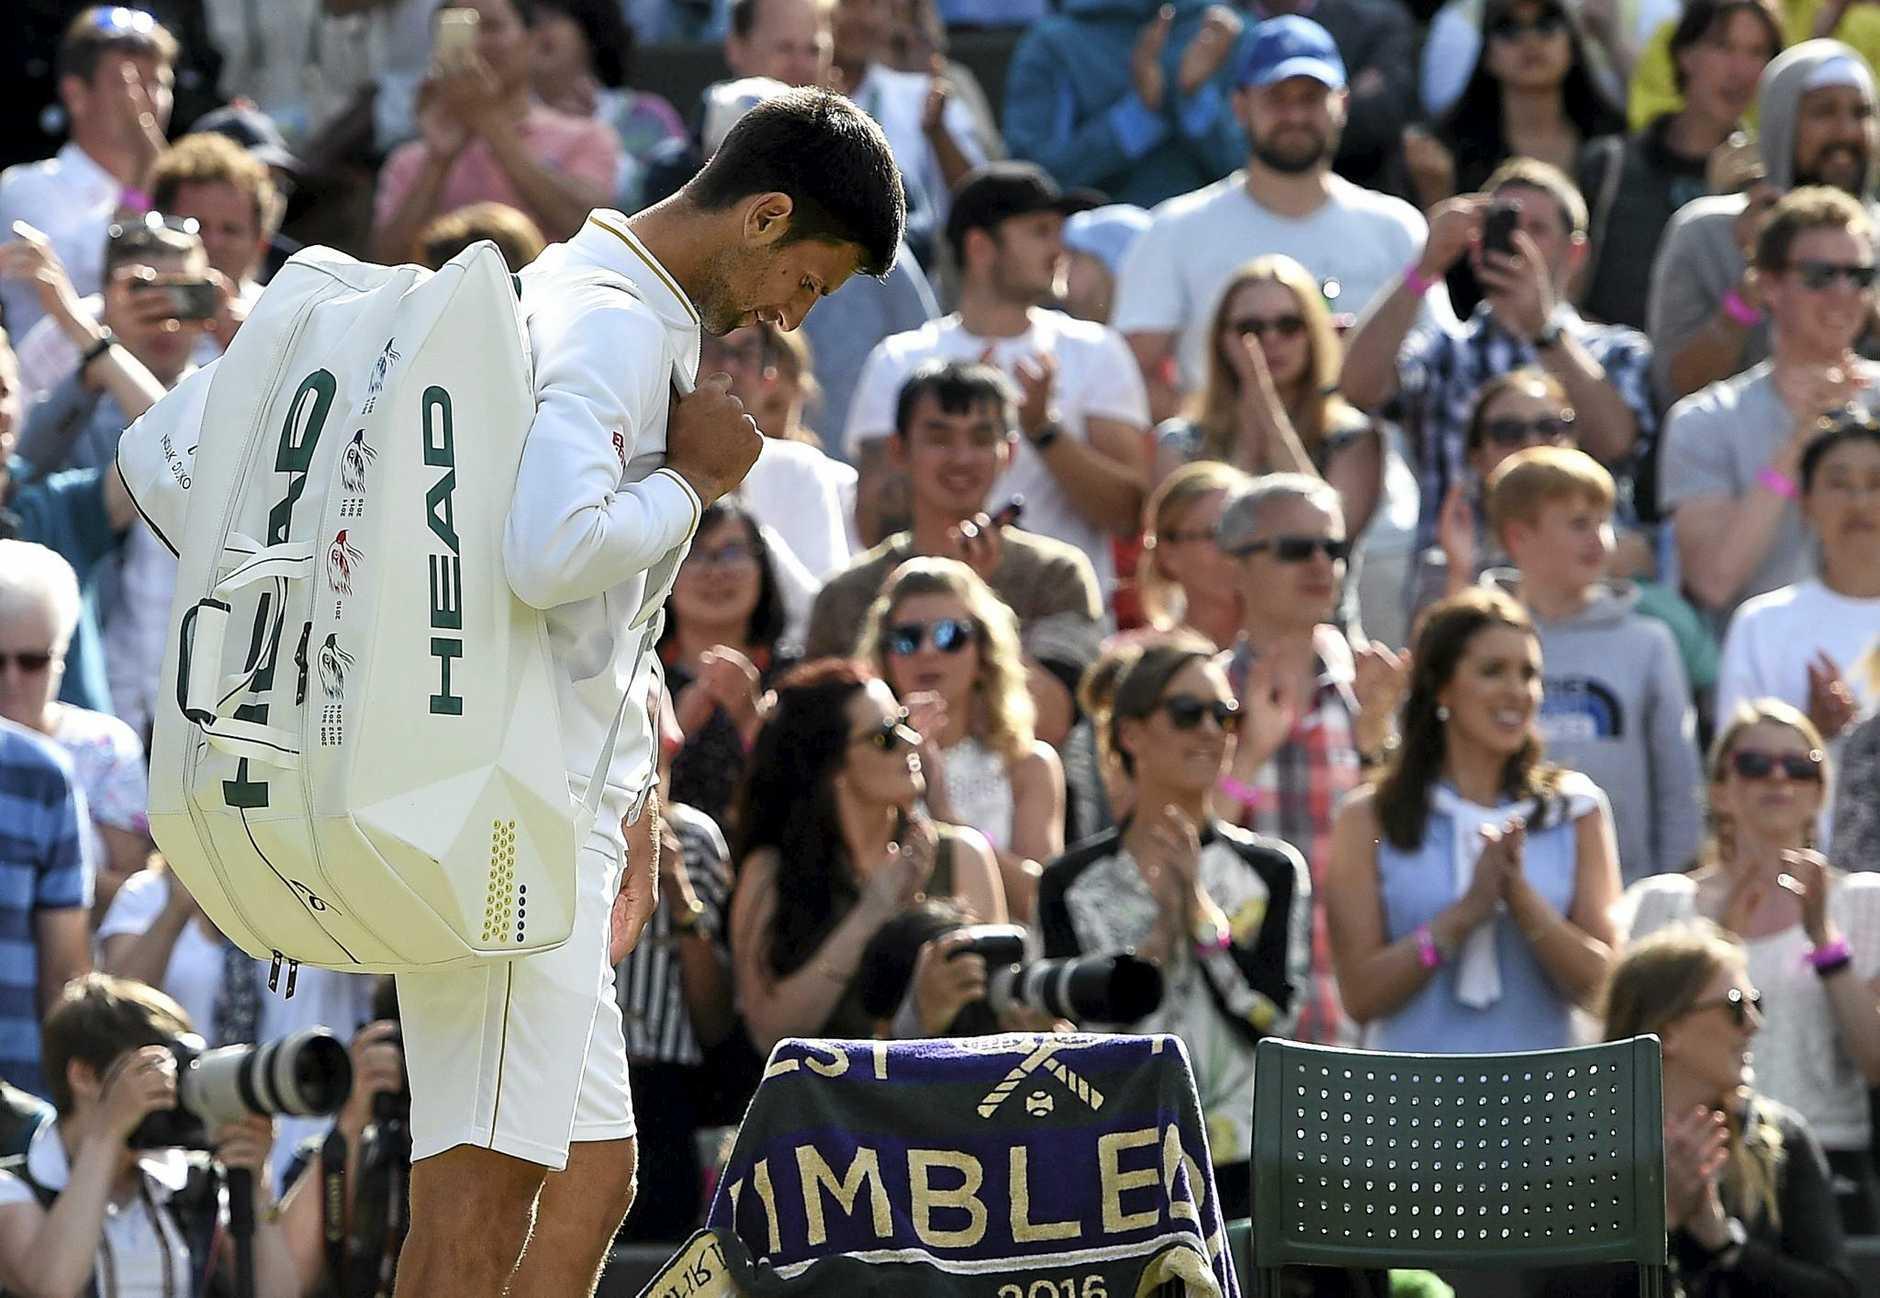 Novak Djokovic walks off court following his defeat by Sam Querrey.